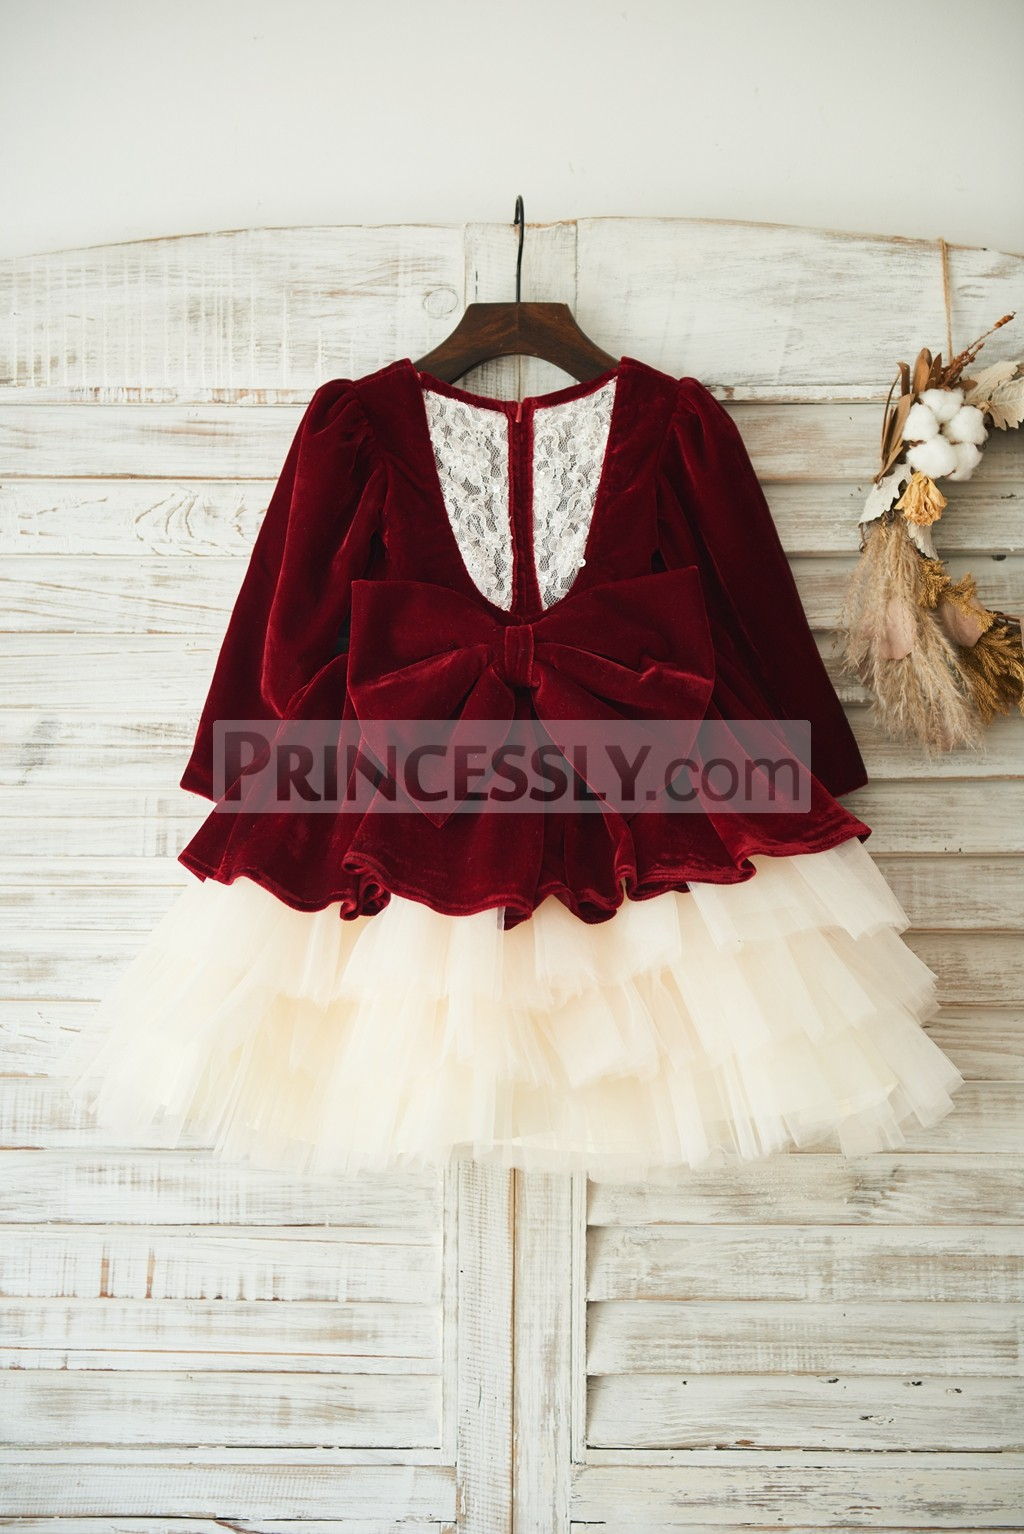 Princessly.com-K1003500-Red Velvet Champagne Tulle Wedding Party Flower Girl Dress with Long Sleeves-31